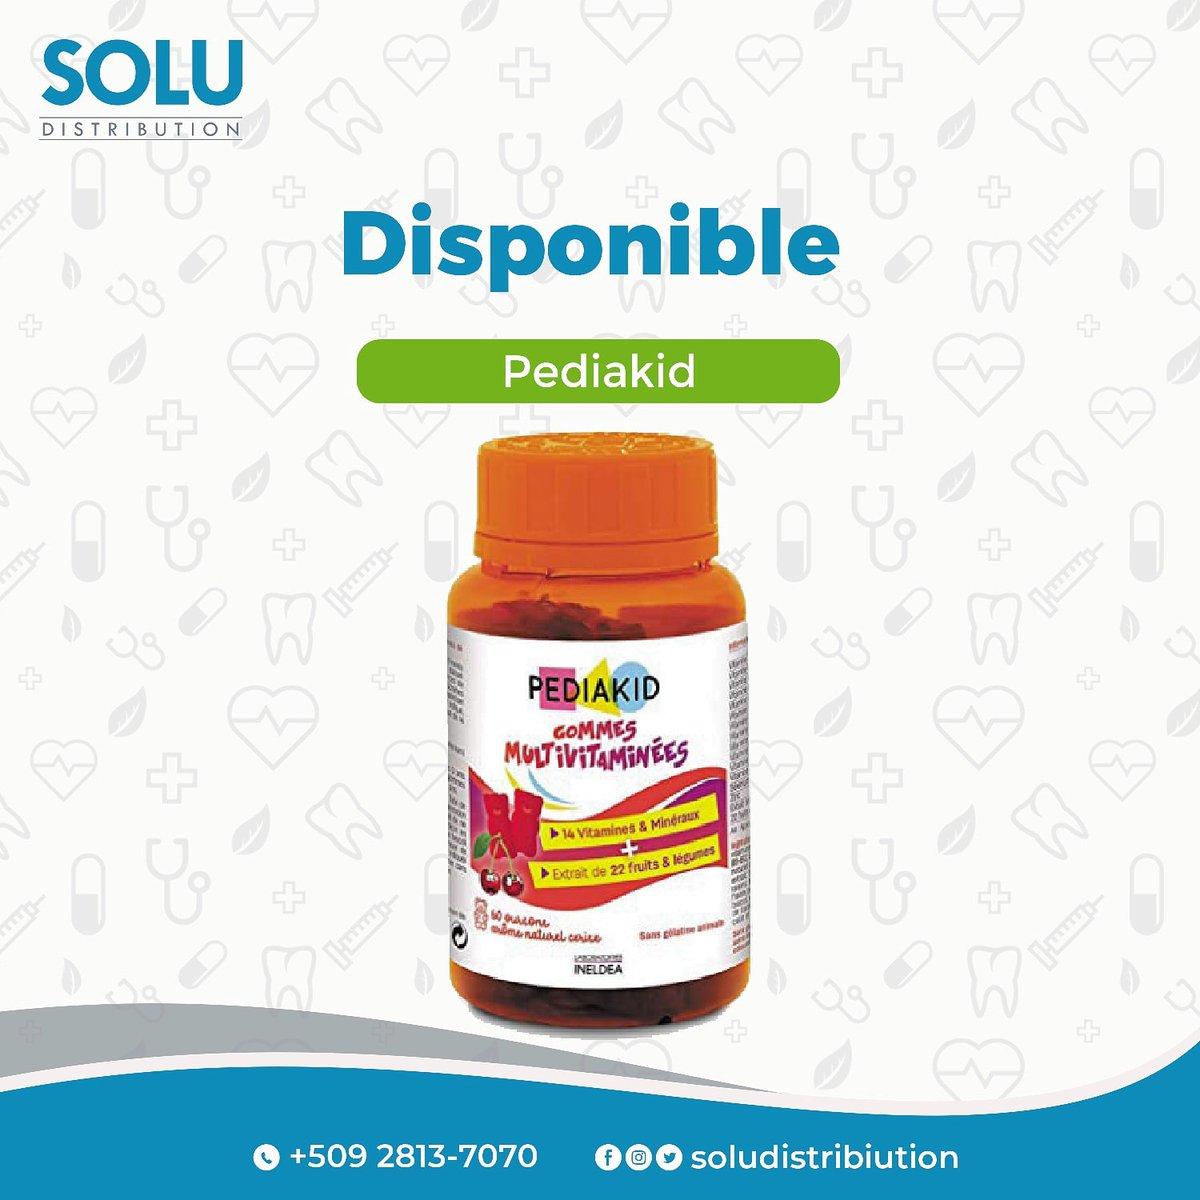 Pediakid Multivitamines #pharmaprixhaiti #ayiti #ayiti509 #haiti #haiti509 #vitamins #pharmaceutics #pharmacognosy #healthy #farmasi #kids #Bébé #baby #sirop #pharmaceutical #vitamins #multivitamins #ayitipharmacie #haitipharmacie. #ayitifamasi